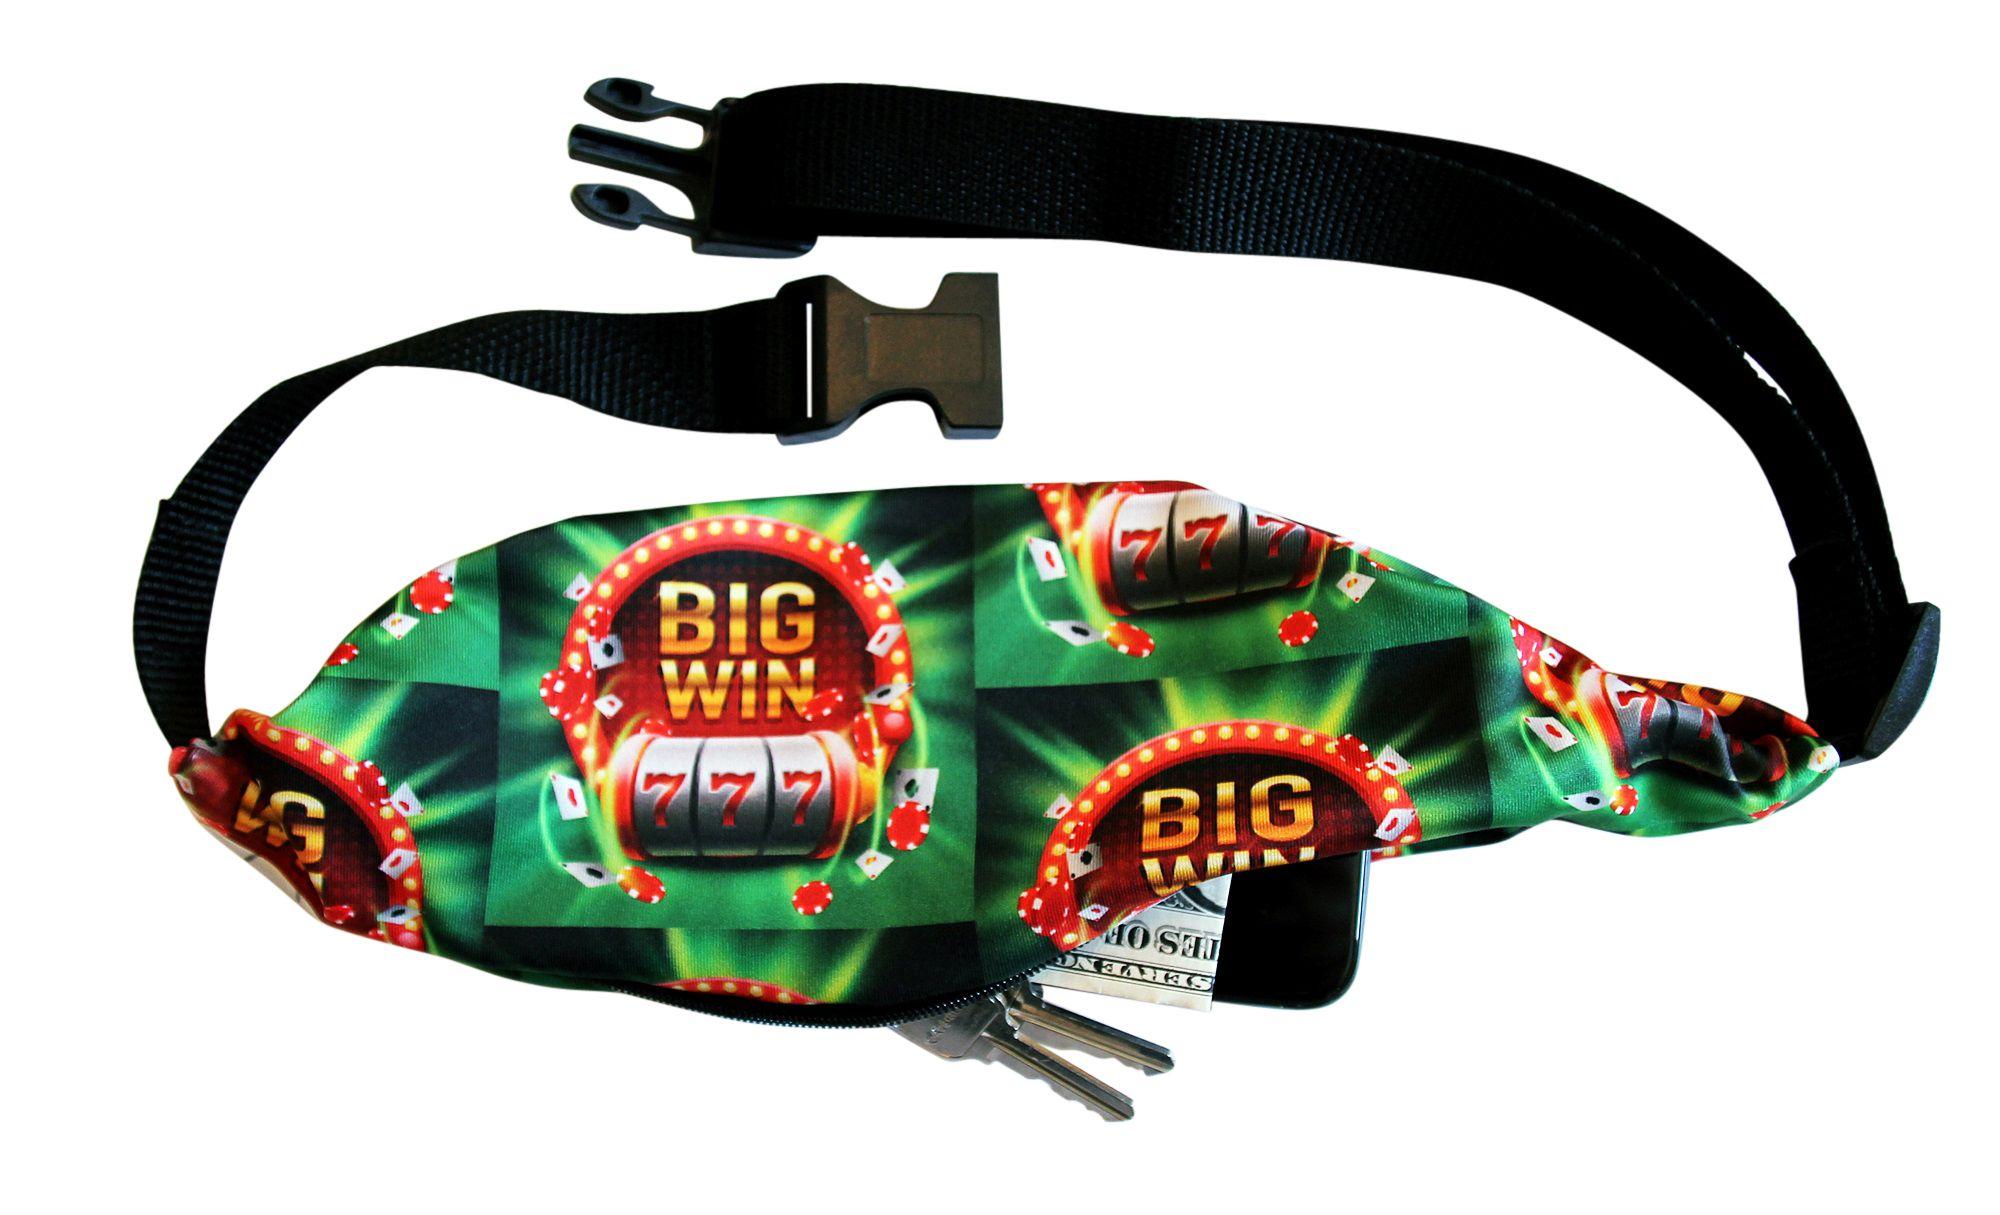 Pin on Running Belts (Fanny Packs)